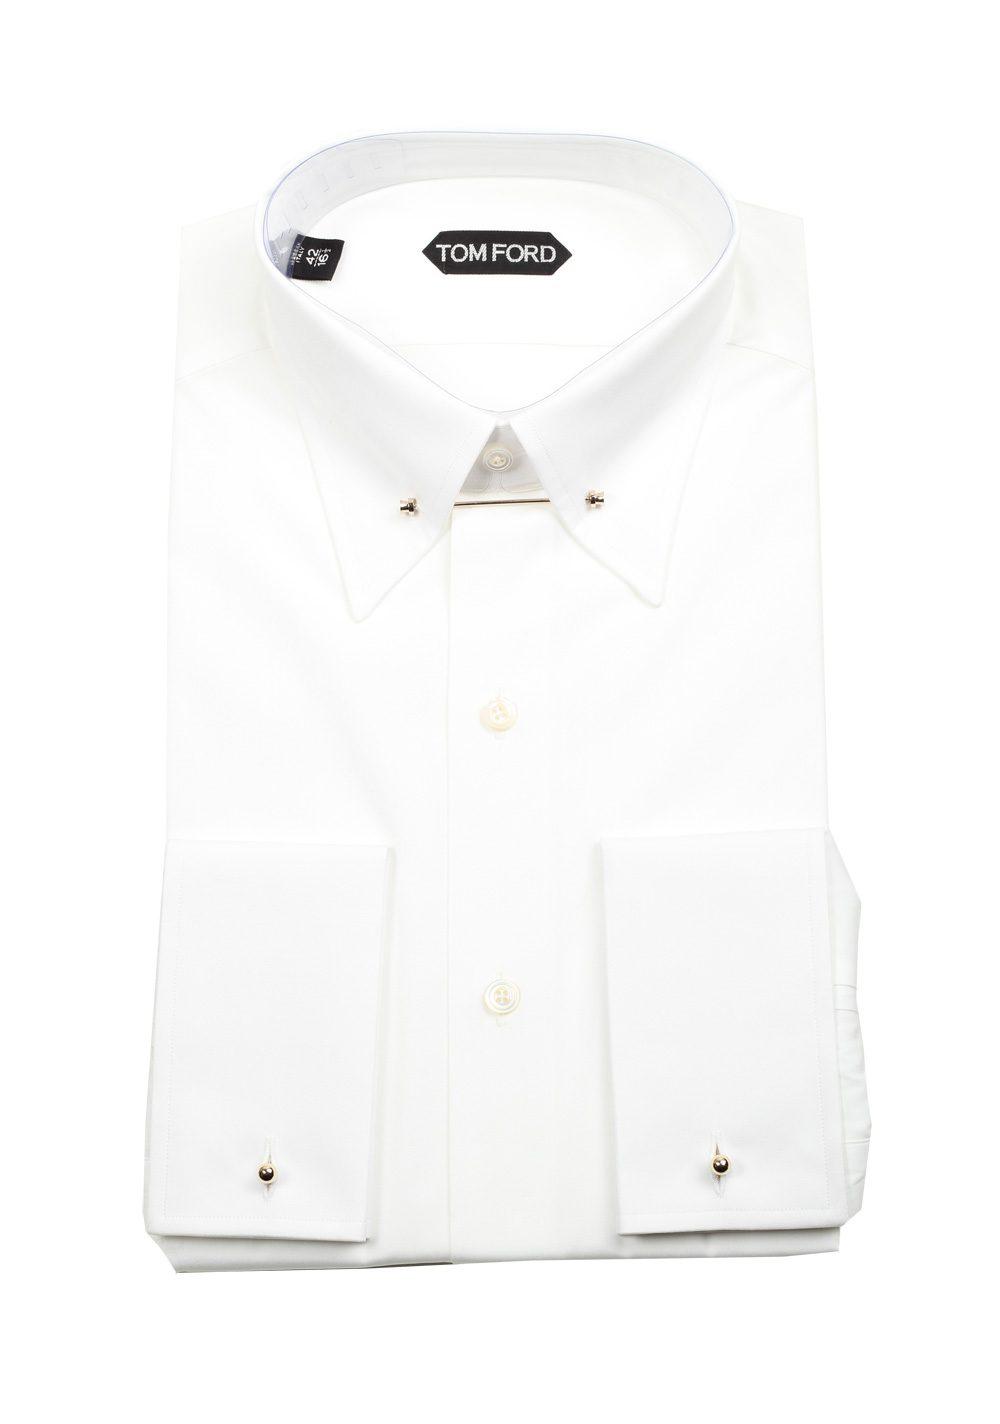 Tom Ford Solid White Poplin Metal Bar Dress Shirt Size 42 165